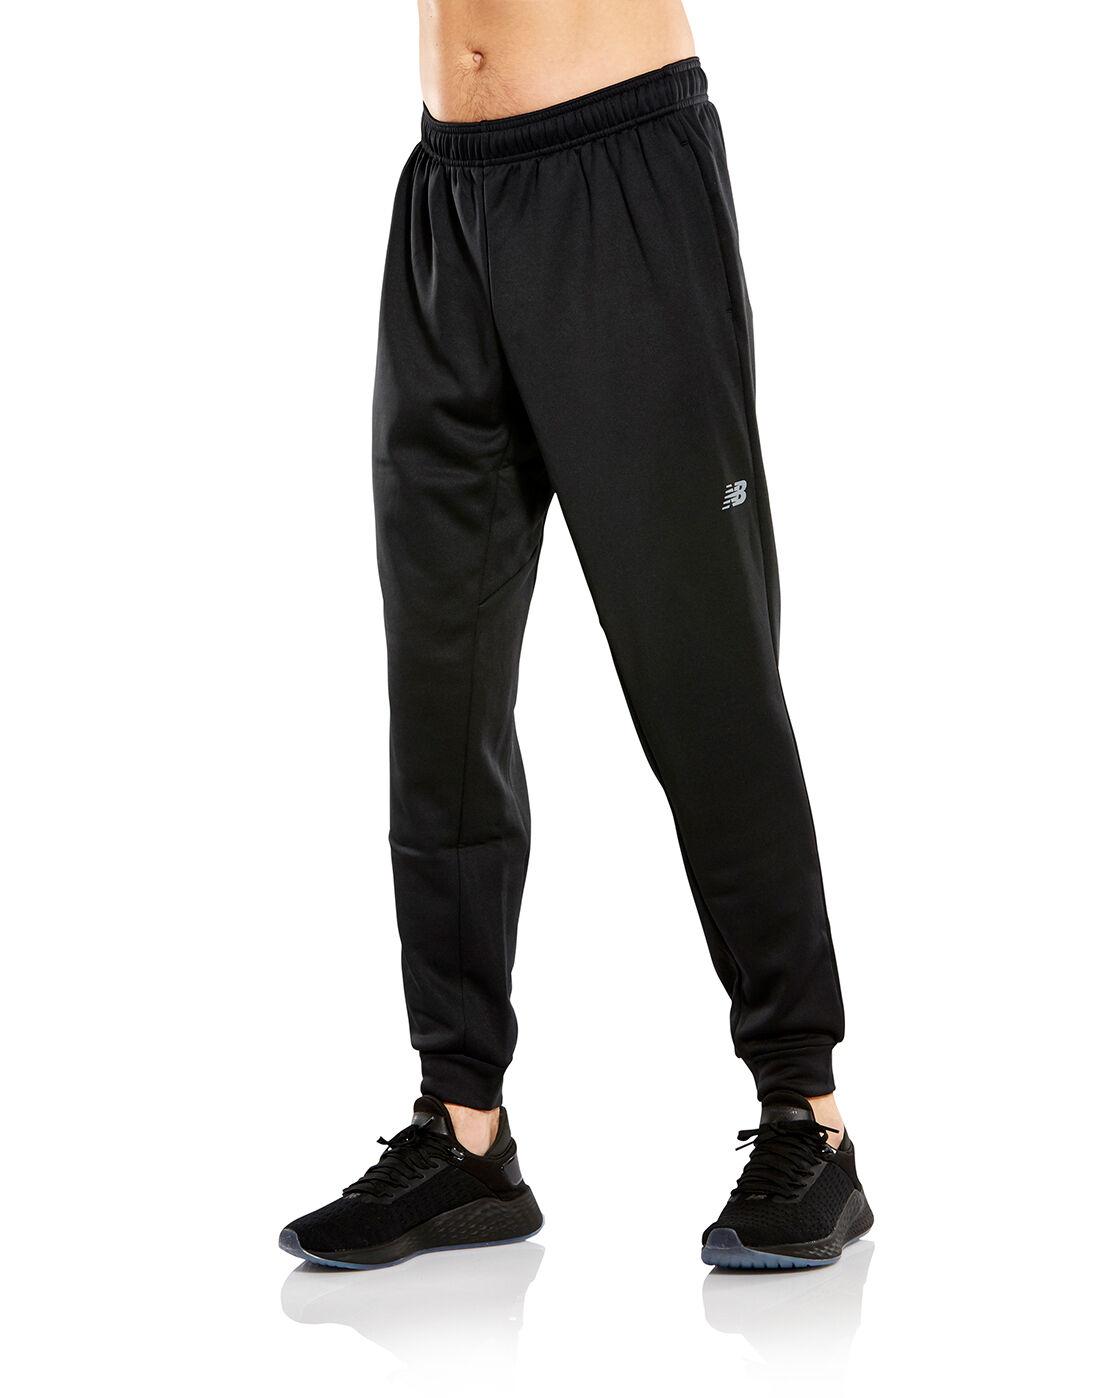 Men's Black New Balance Fleece Joggers | Life Style Sports